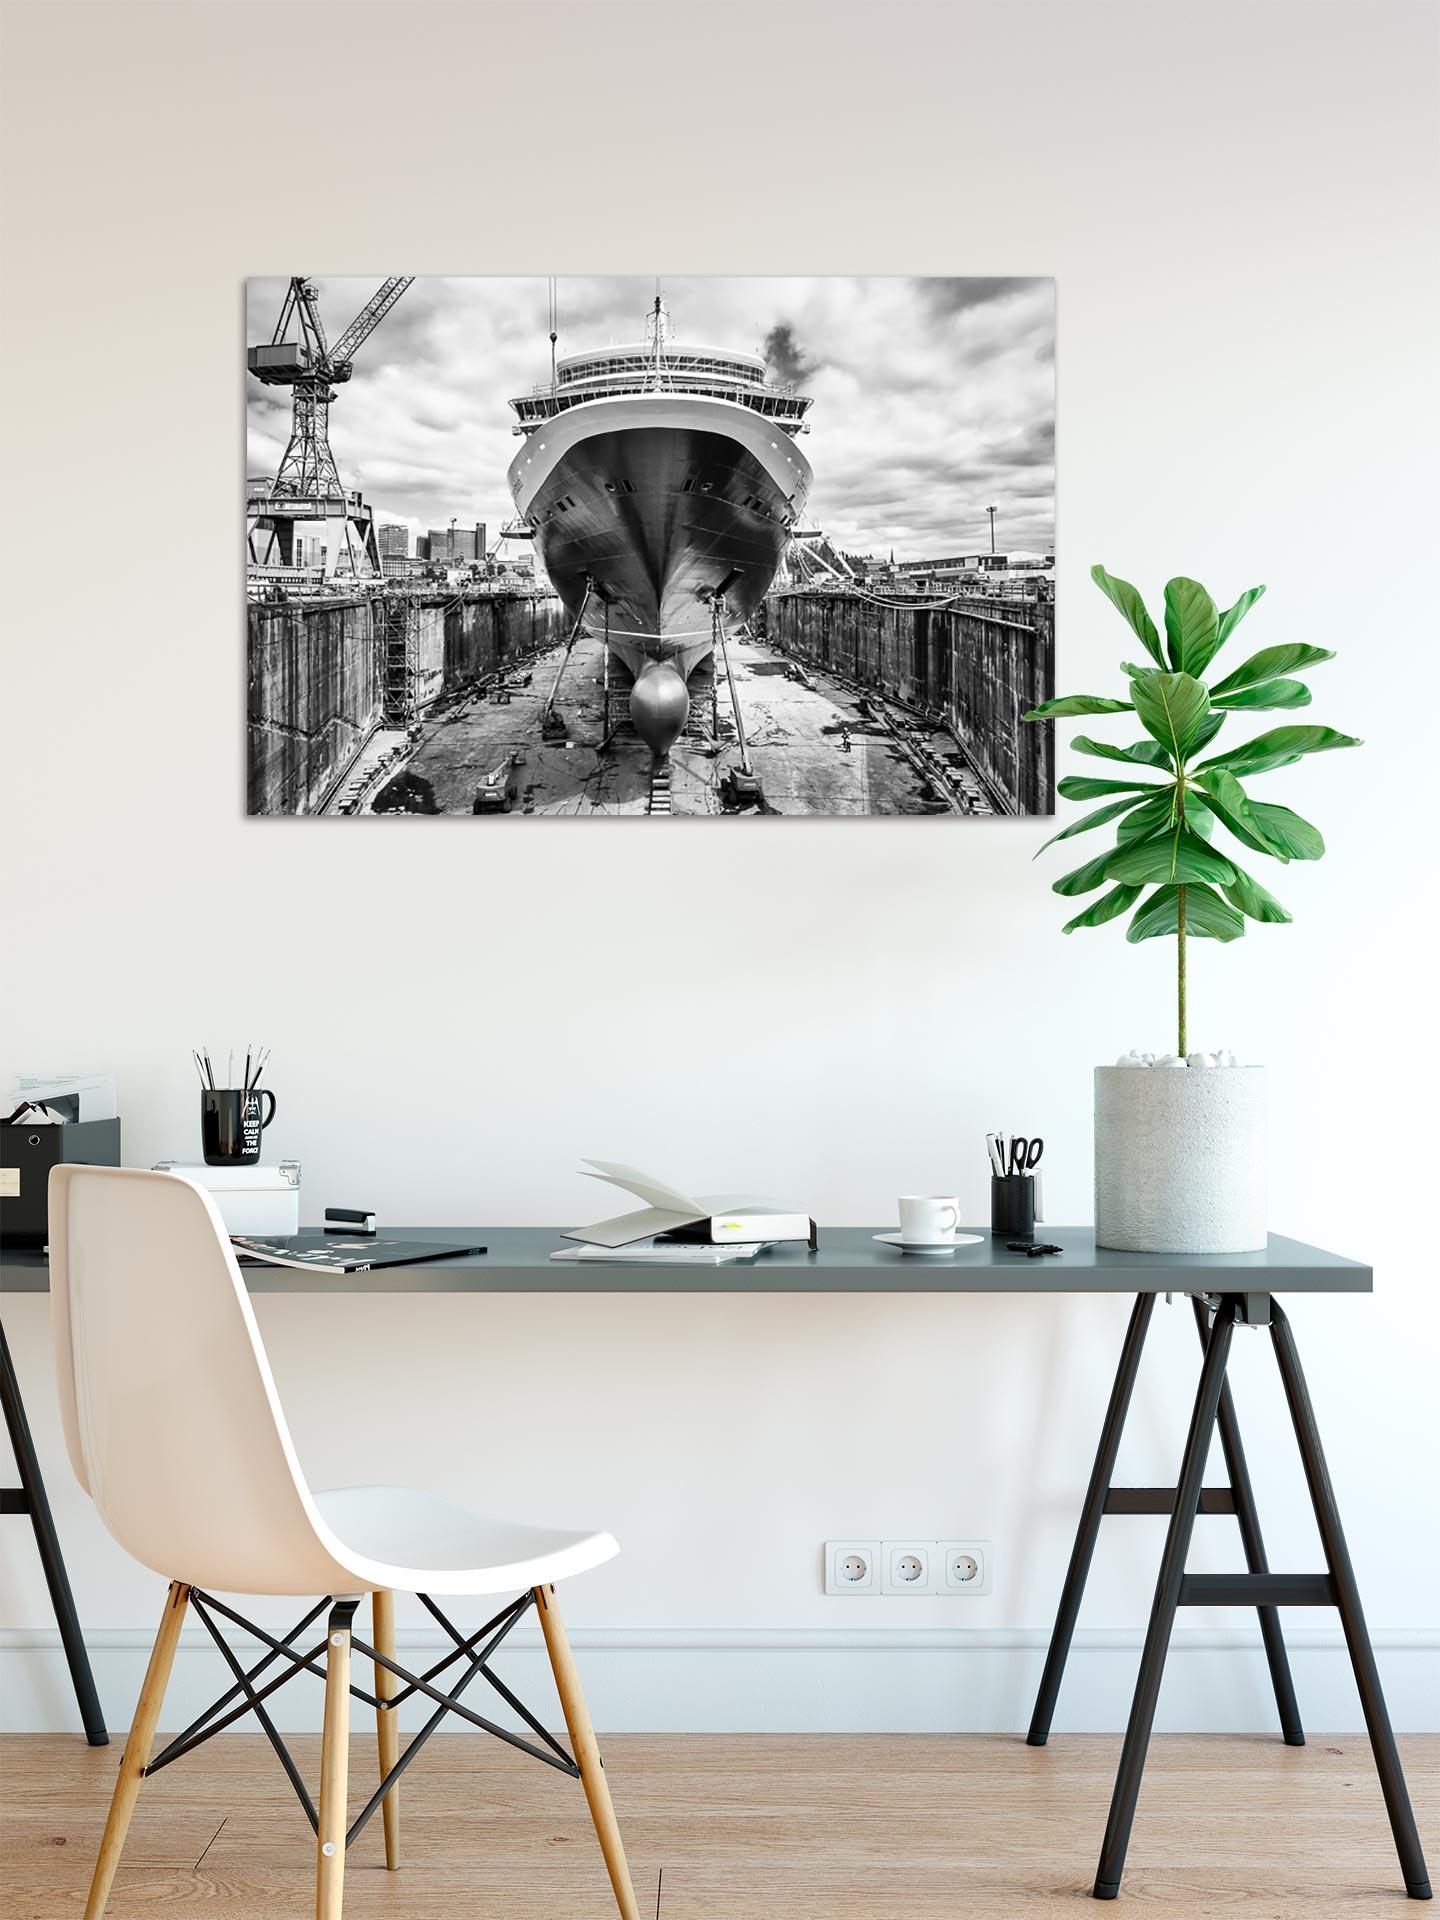 JS004-queen-elisabeth-wandbild-bild-auf-leinwand-acrylglas-aludibond-arbeitszimmer